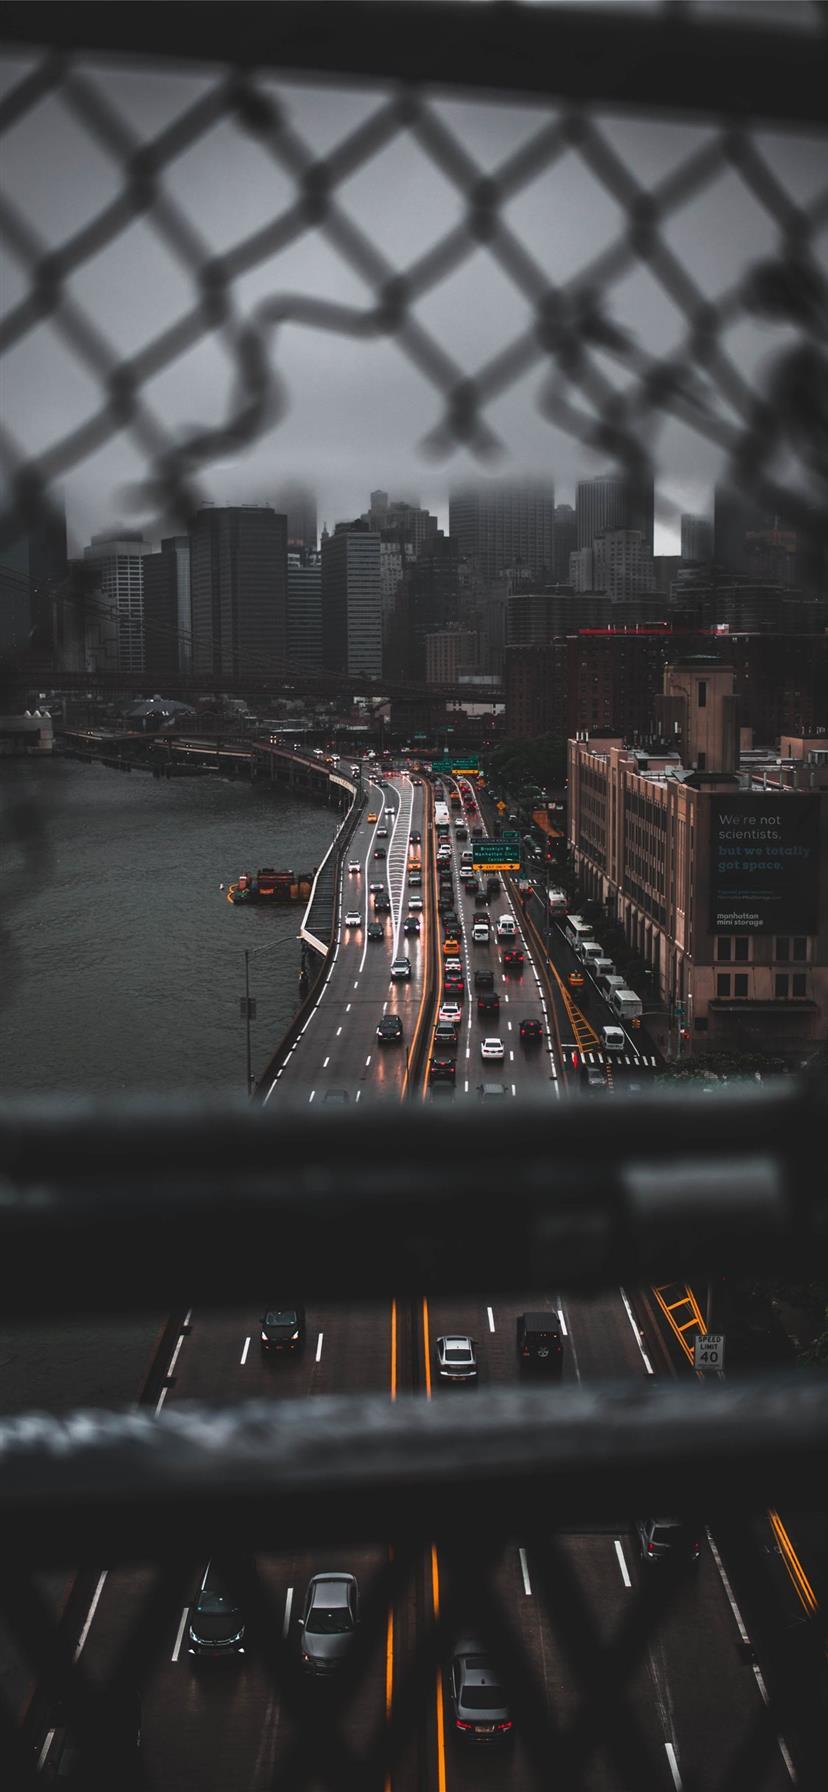 Iphone 11 Wallpaper Iphone 11 Wallpaper New York